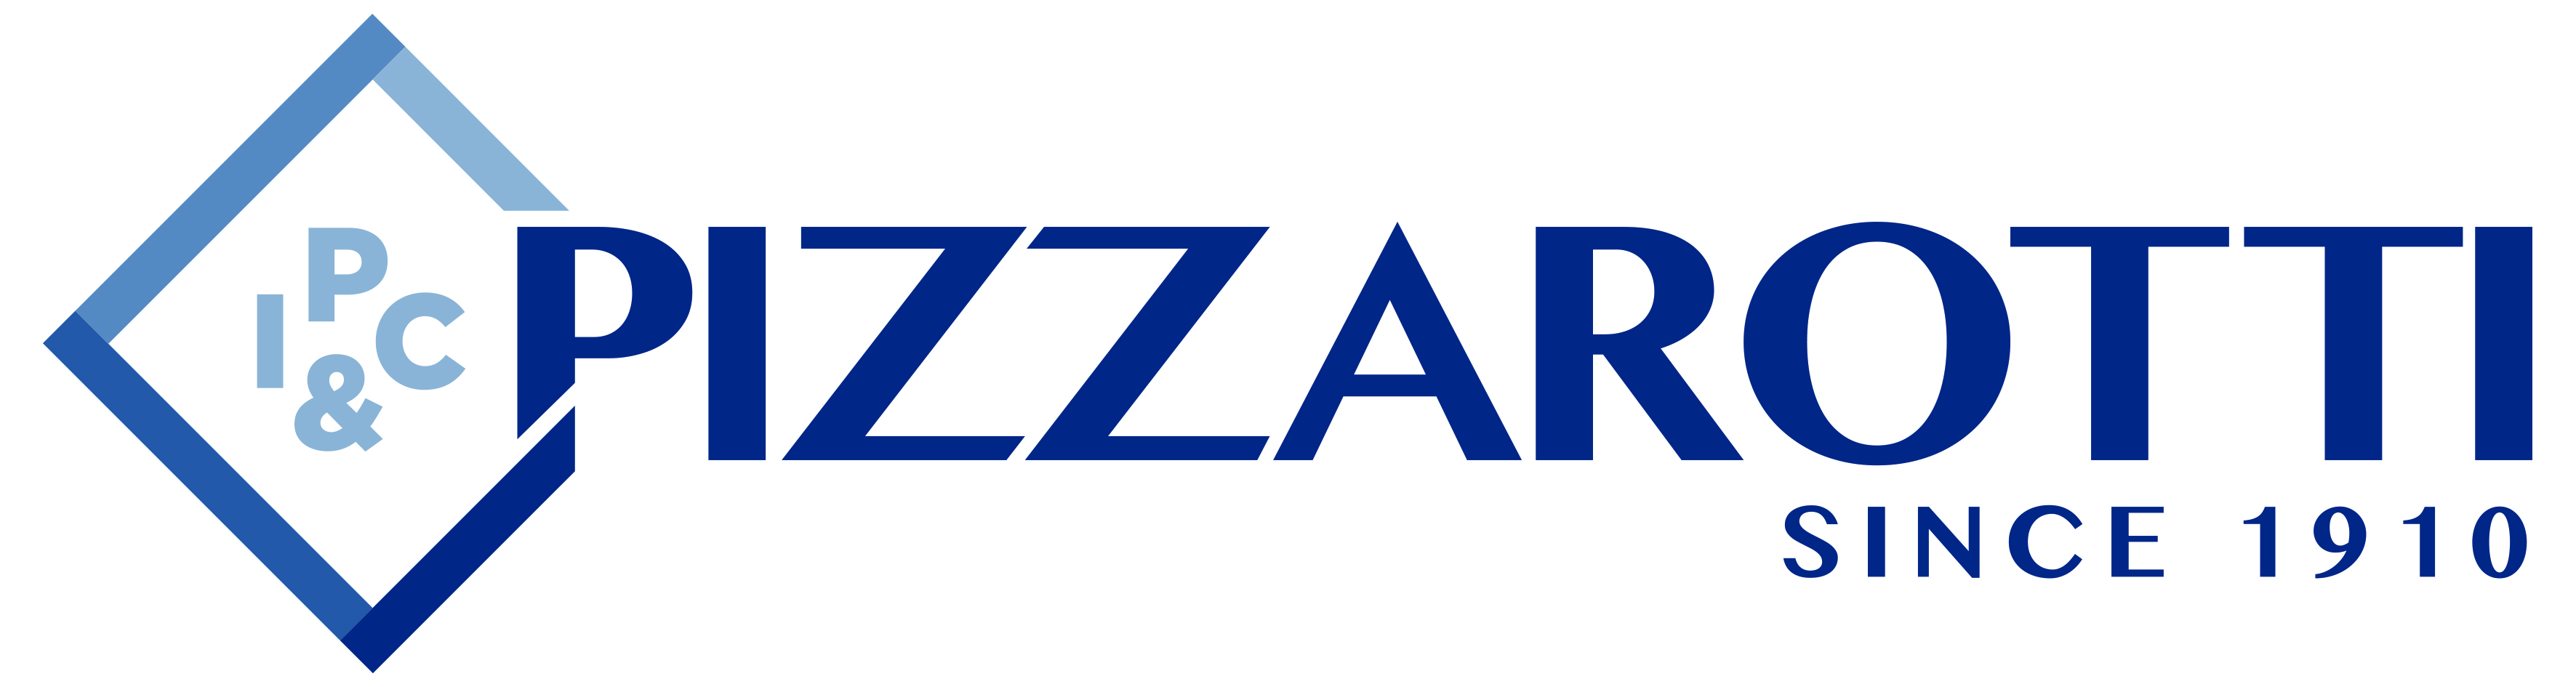 Impresa Pizzarotti & C  S p A